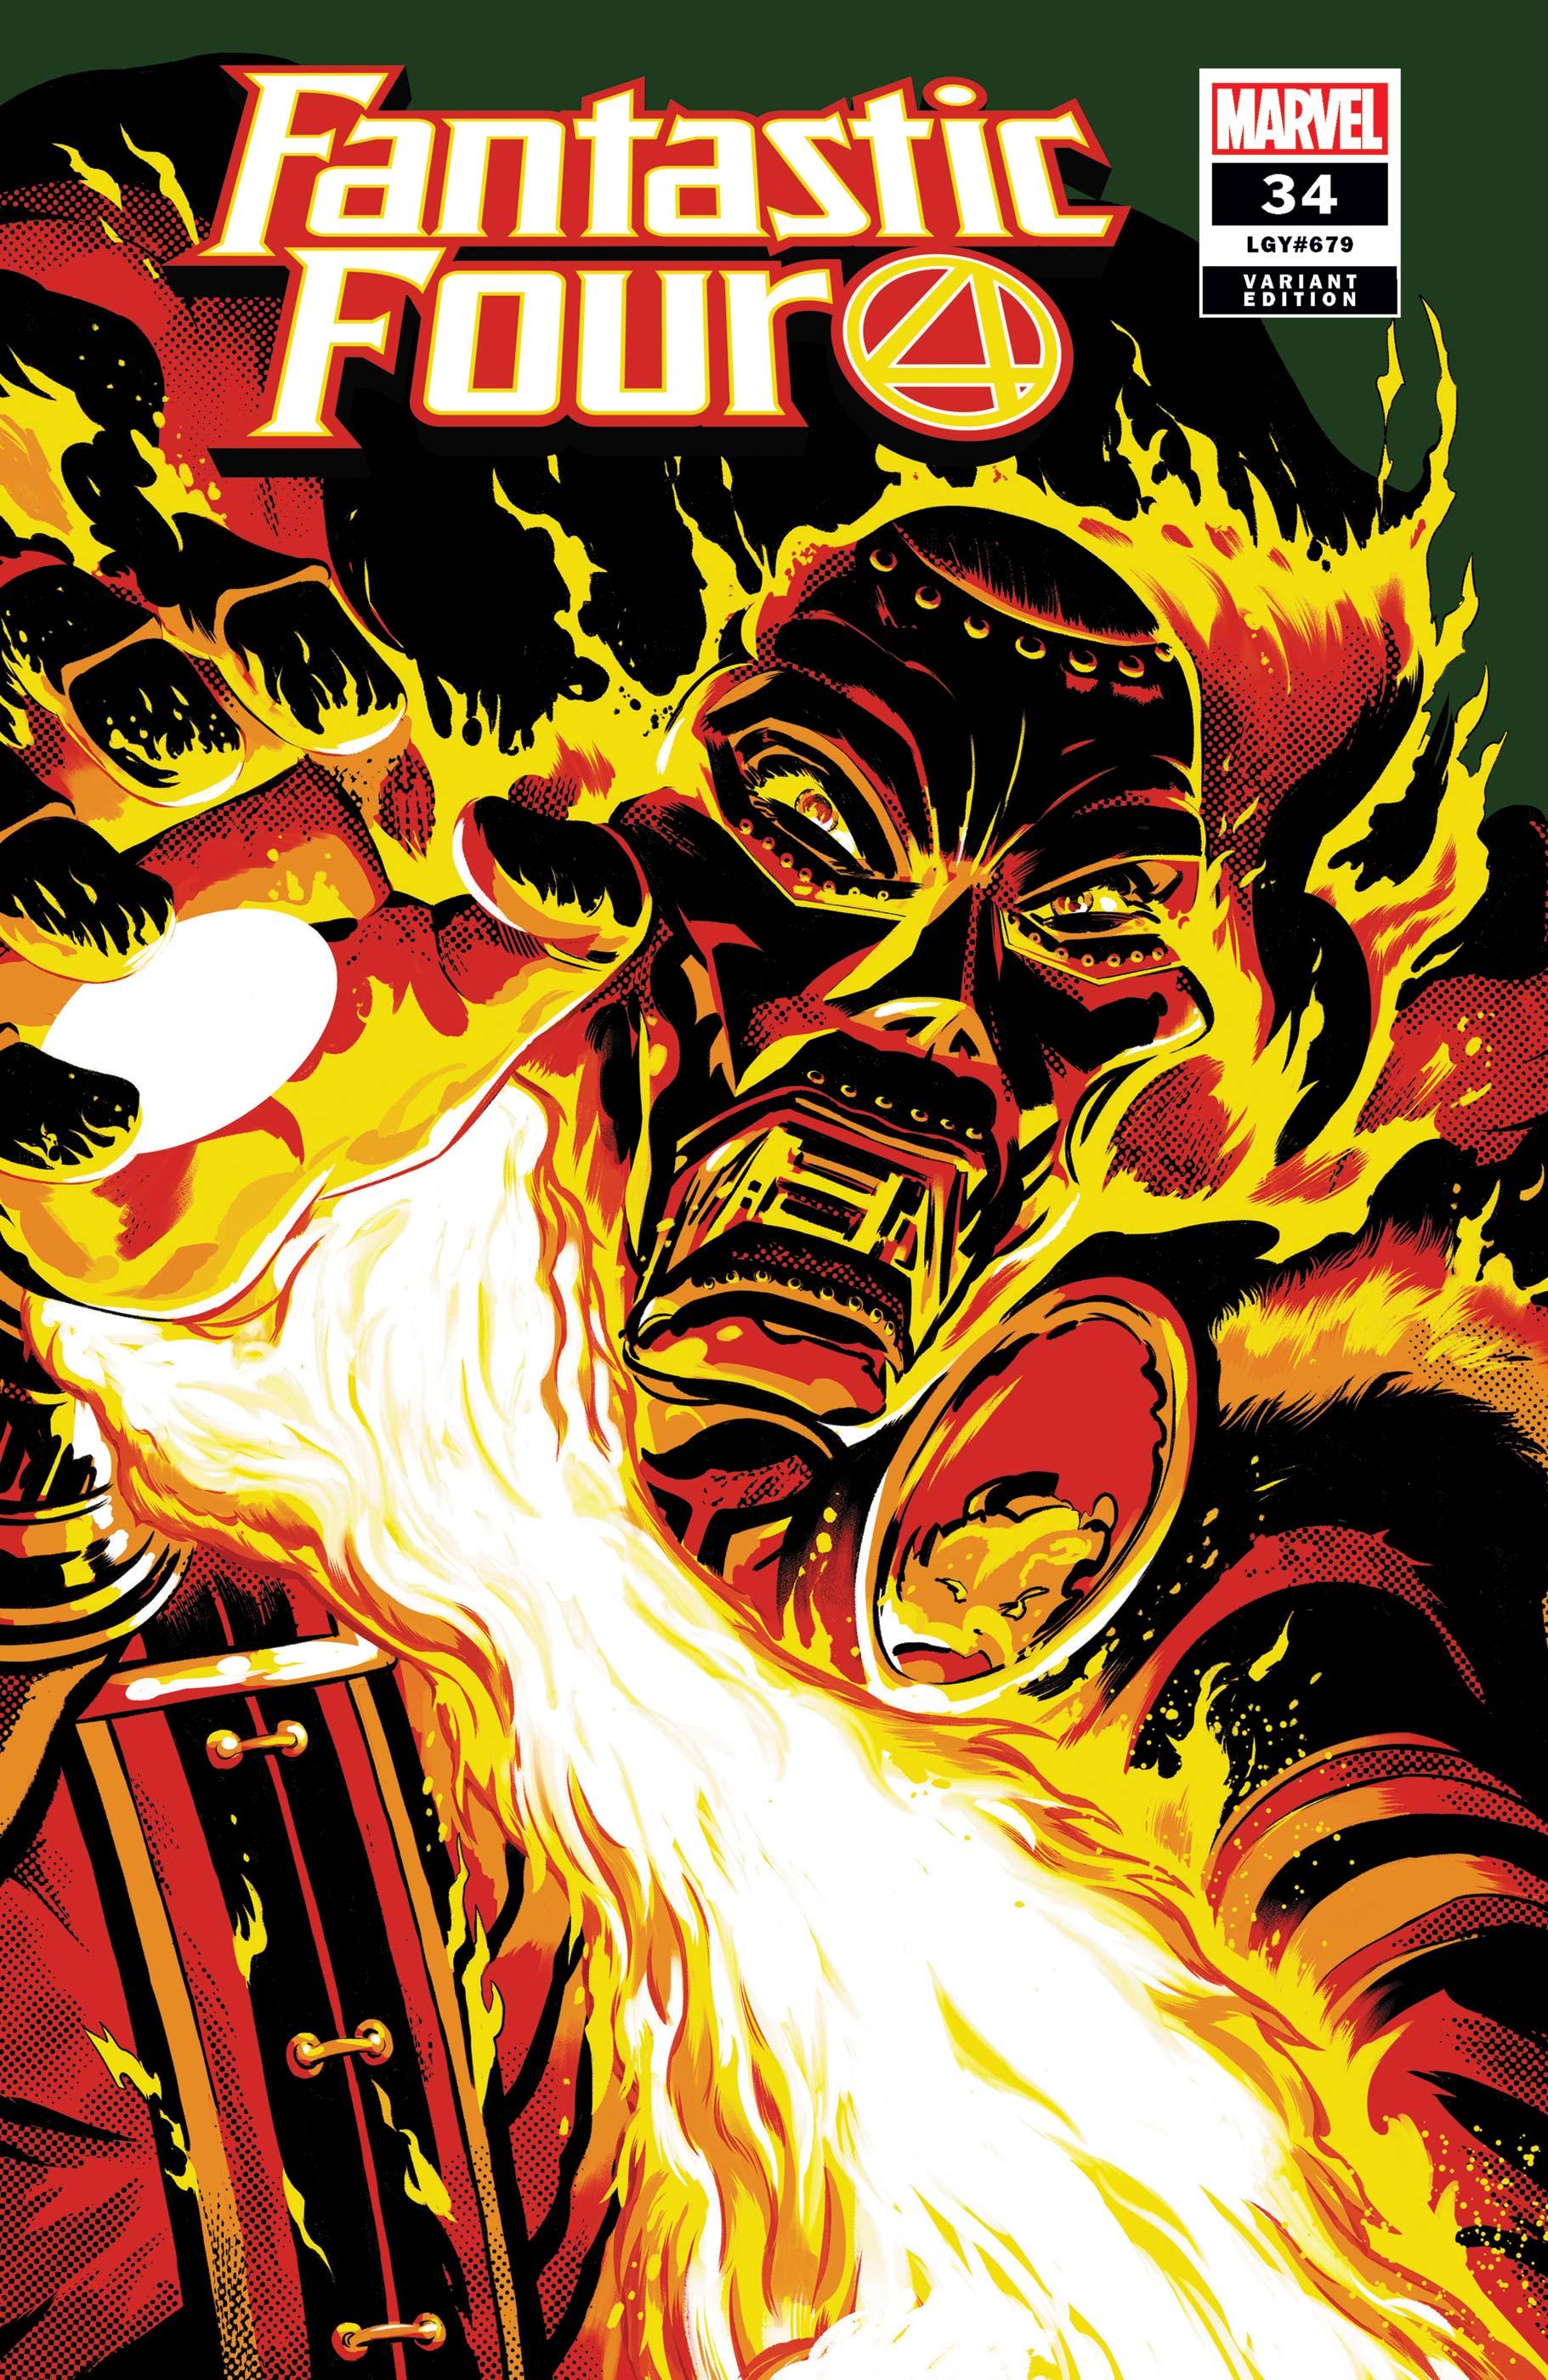 Fantastic Four (2018) #34 (Variant)